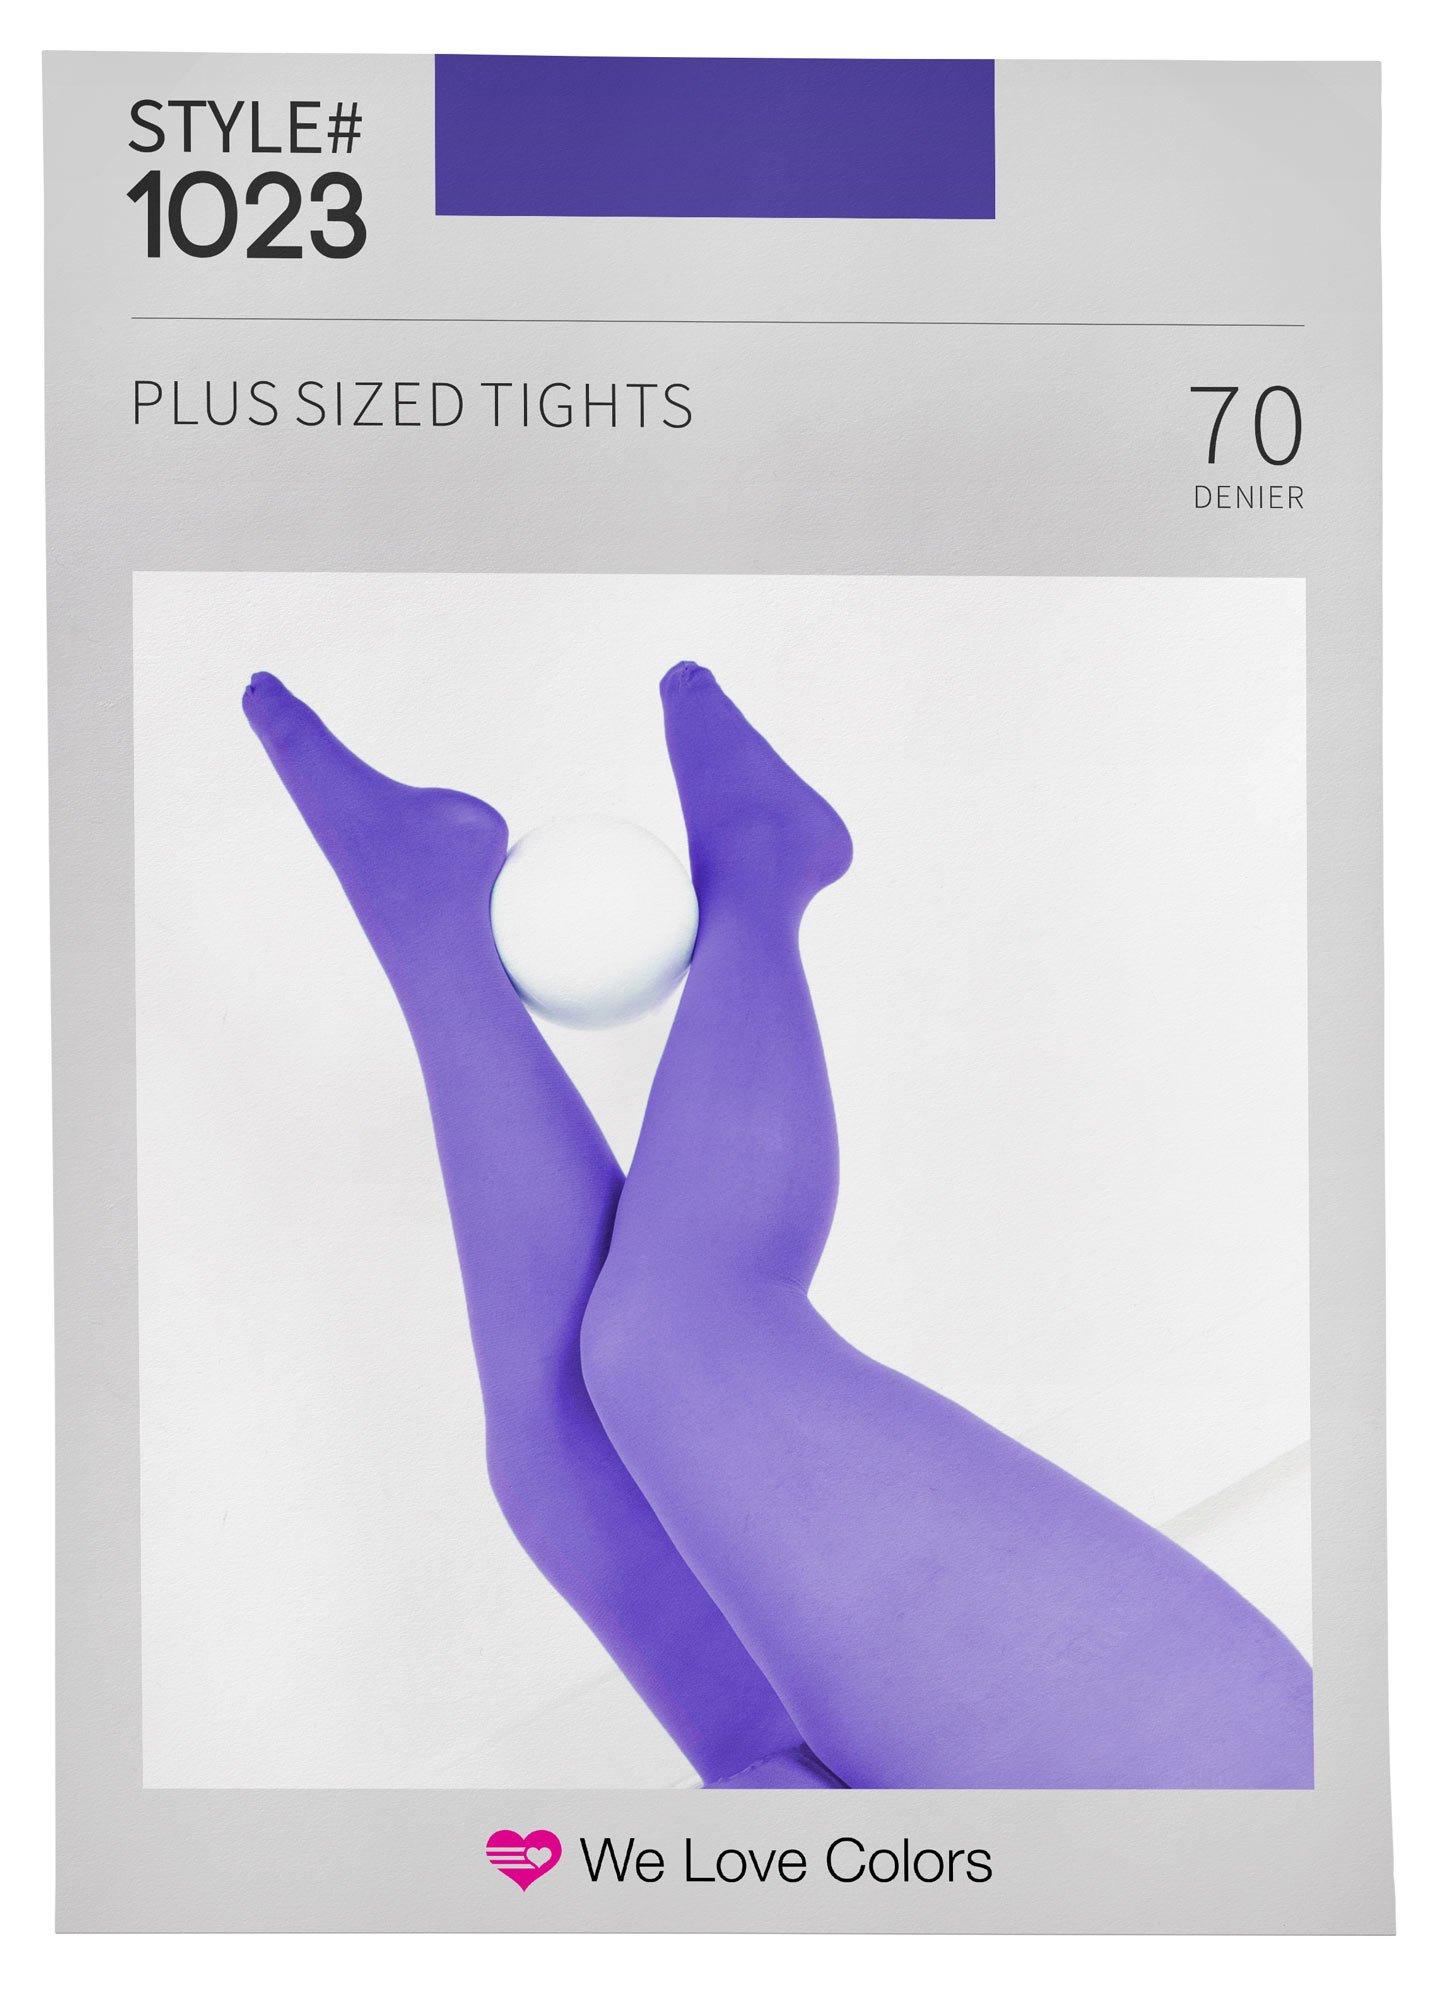 Nylon/Spandex Plus Size Tights - Lavender - 1X